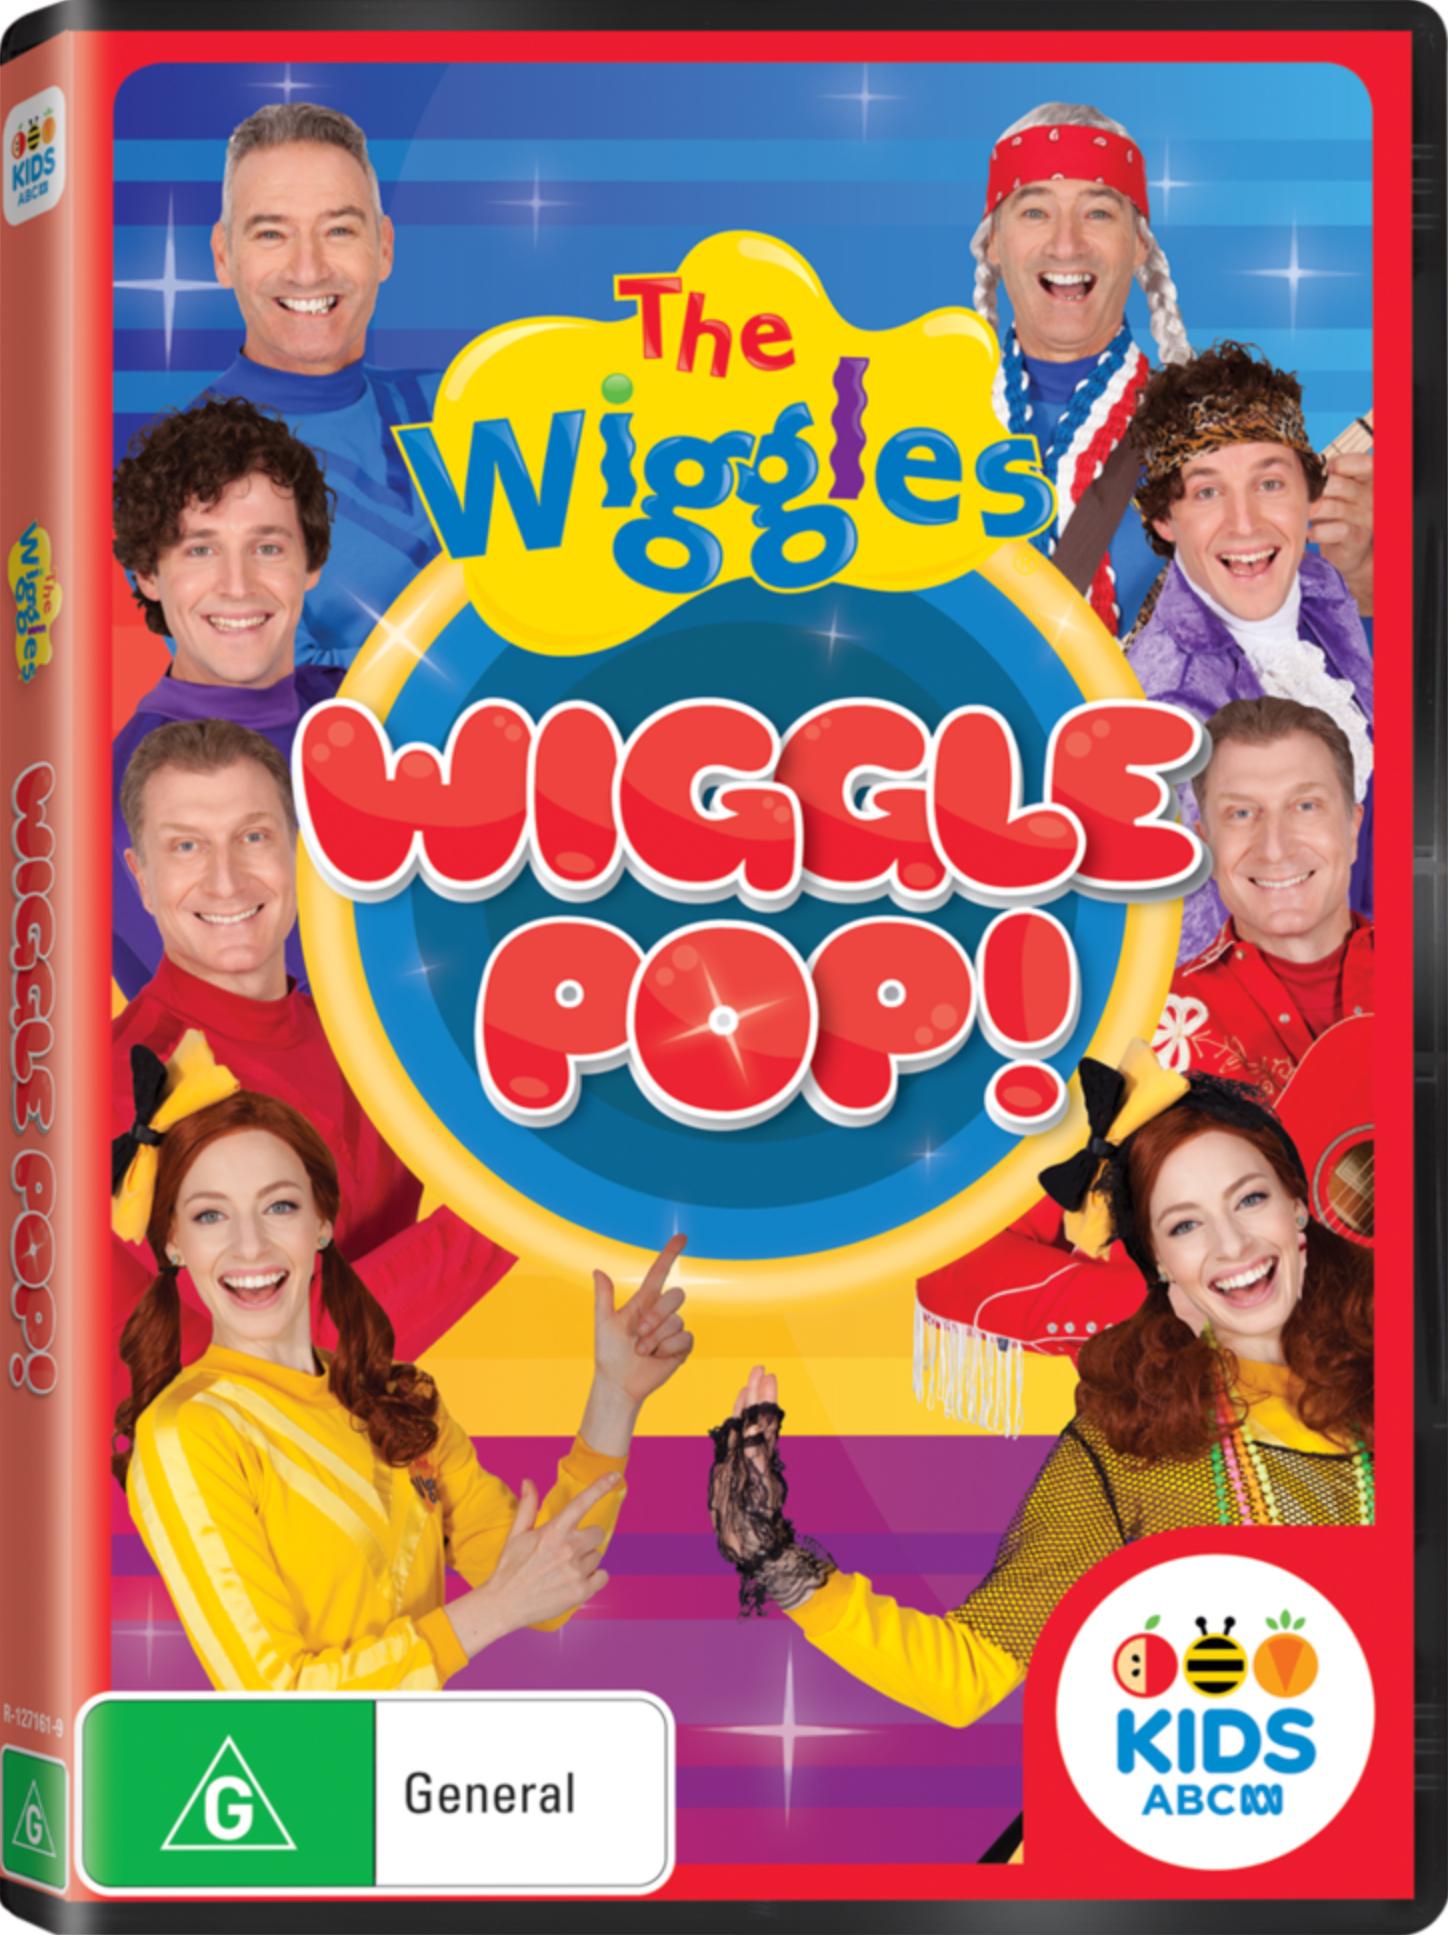 Wiggle Pop! (video)